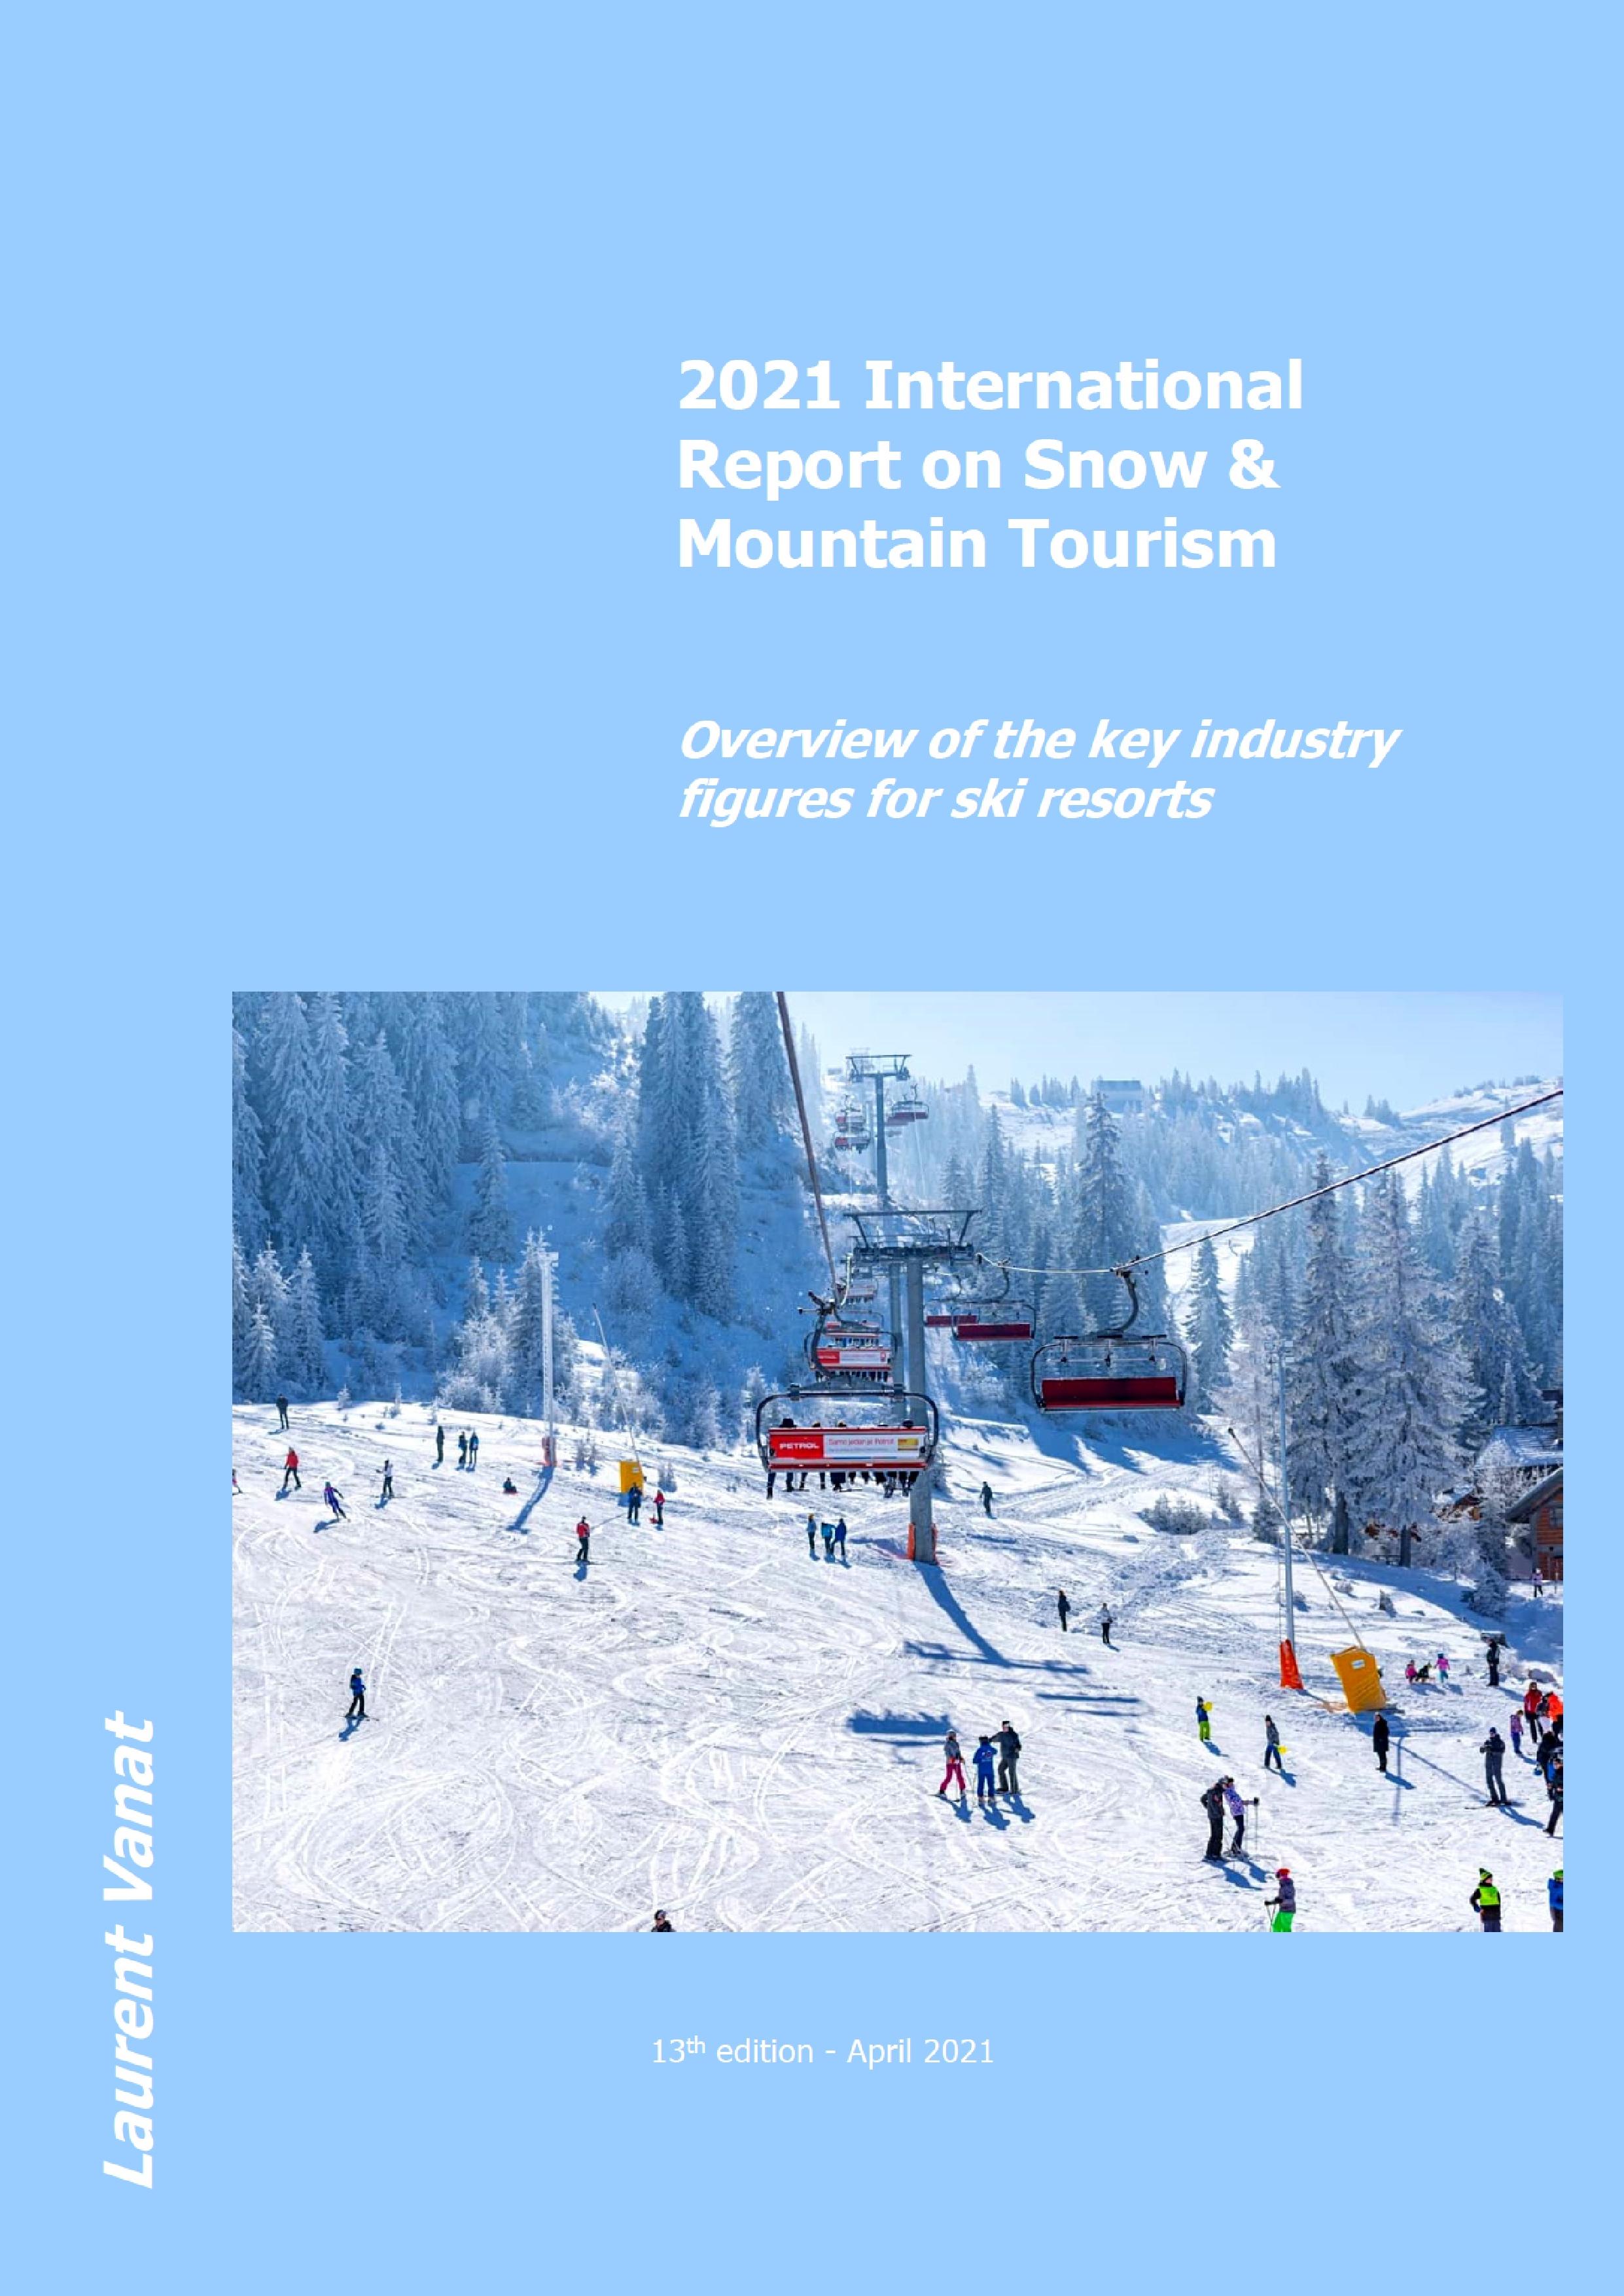 2021 International Snow Report